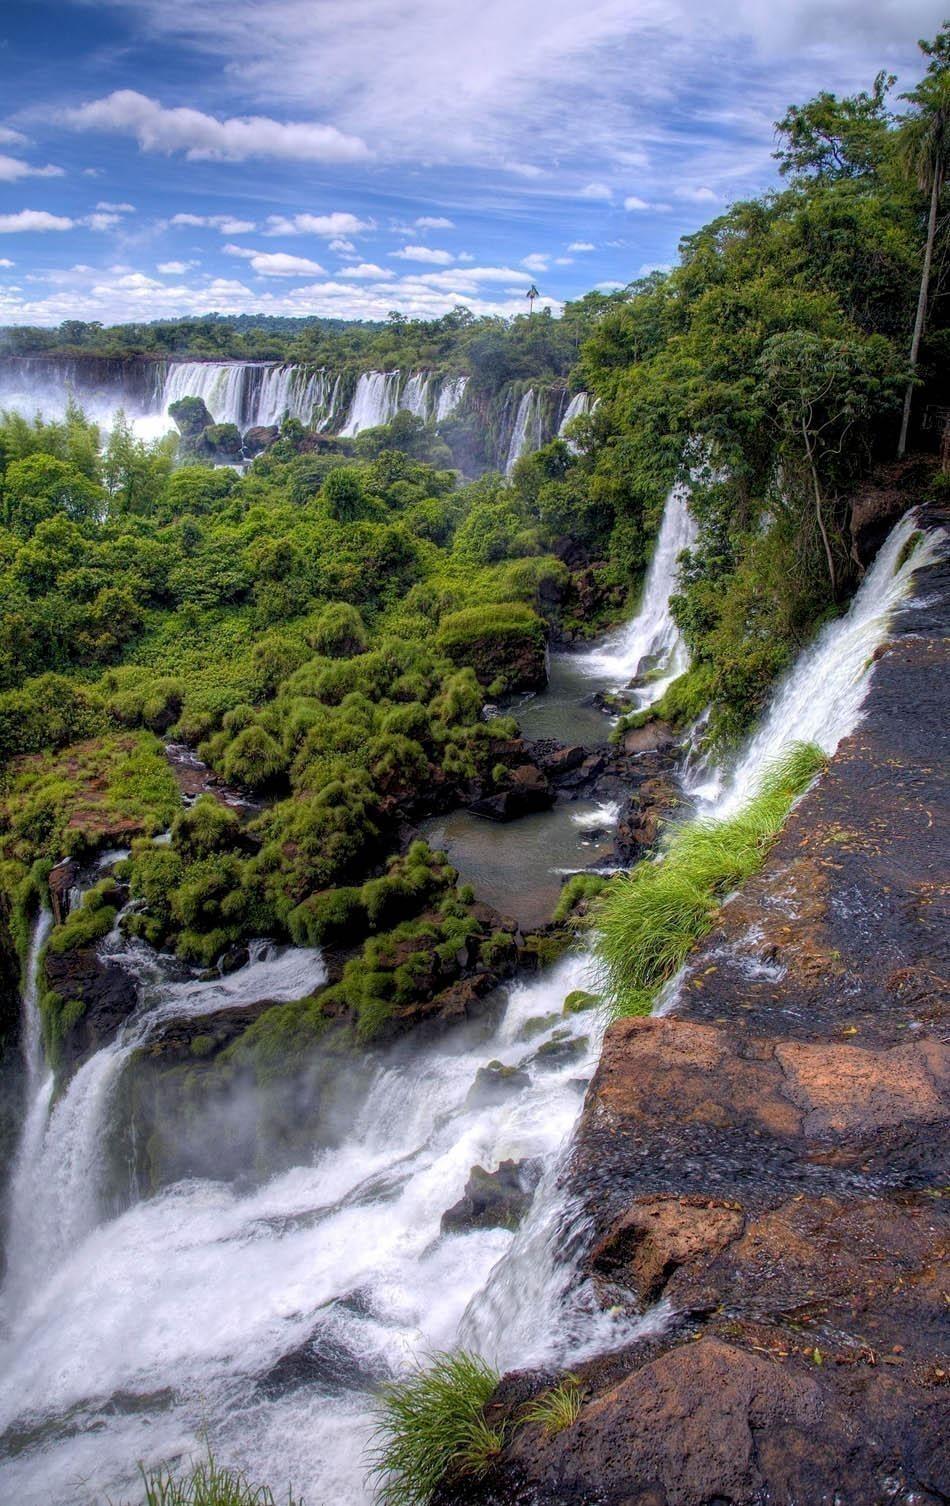 Famous Iguazu falls | Brazil Travel Guide